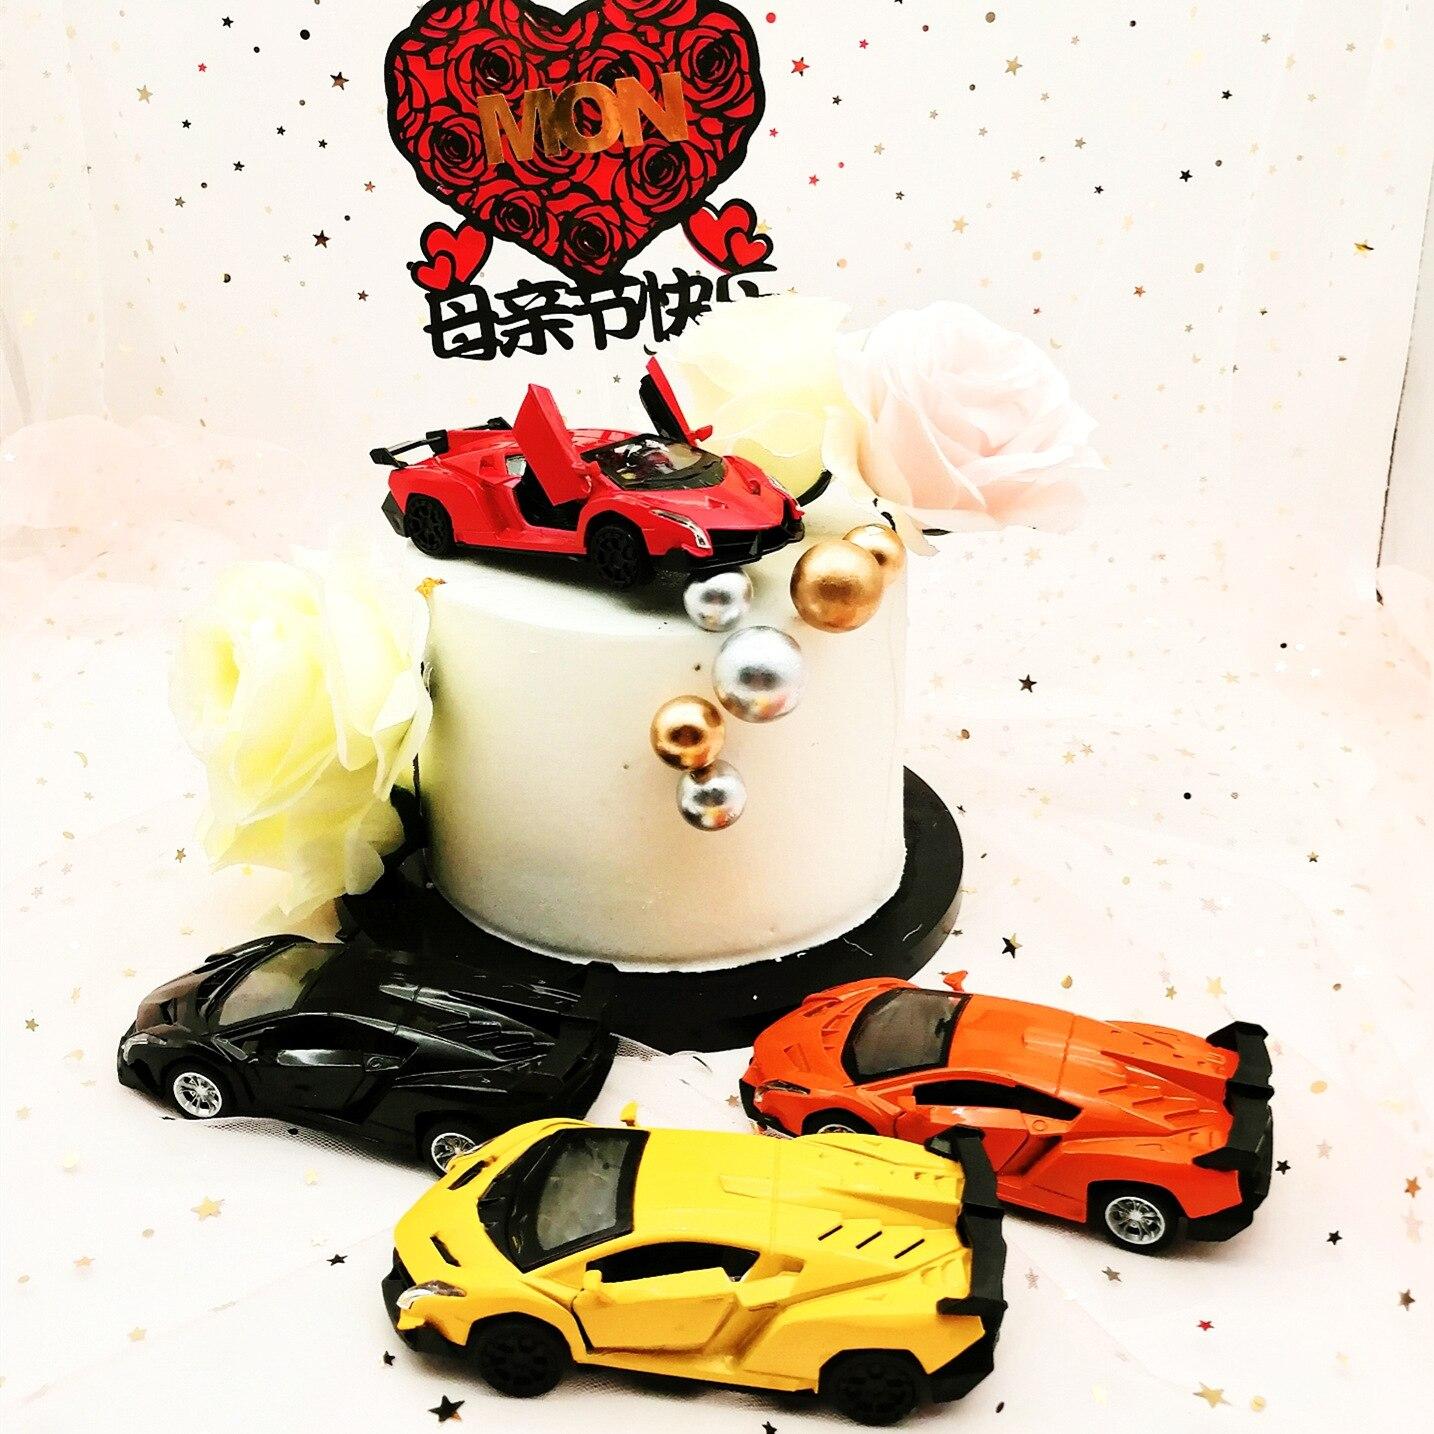 Remarkable Alloy Car Model Cake Decoration Poison Lamborghini Car Model Toy Funny Birthday Cards Online Kookostrdamsfinfo